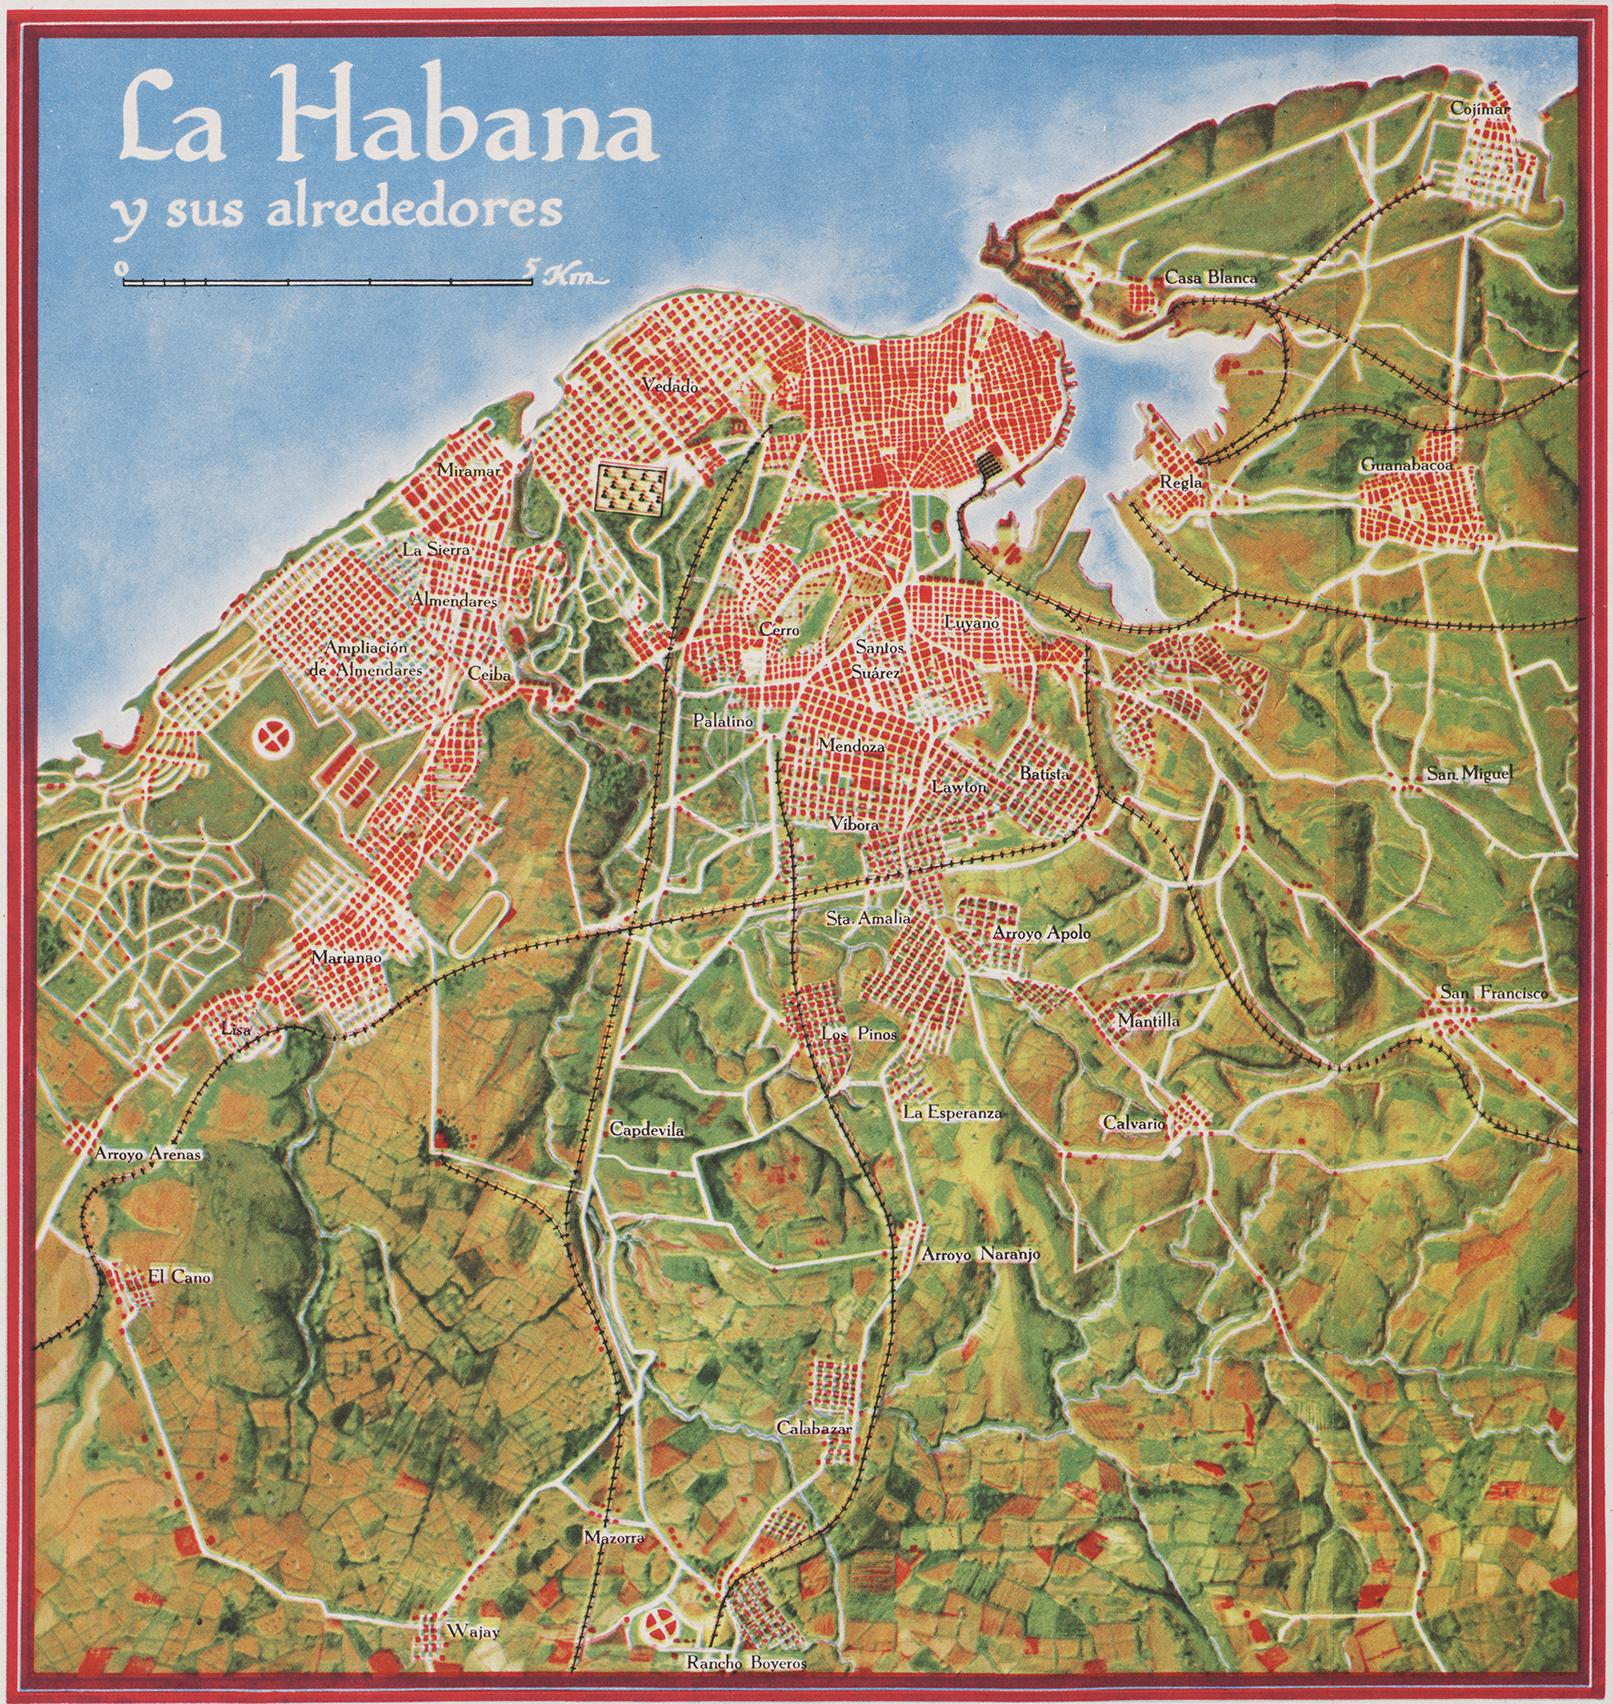 Plano La Habana 1949 Gerardo Canet Erwin Raisz mapa de los